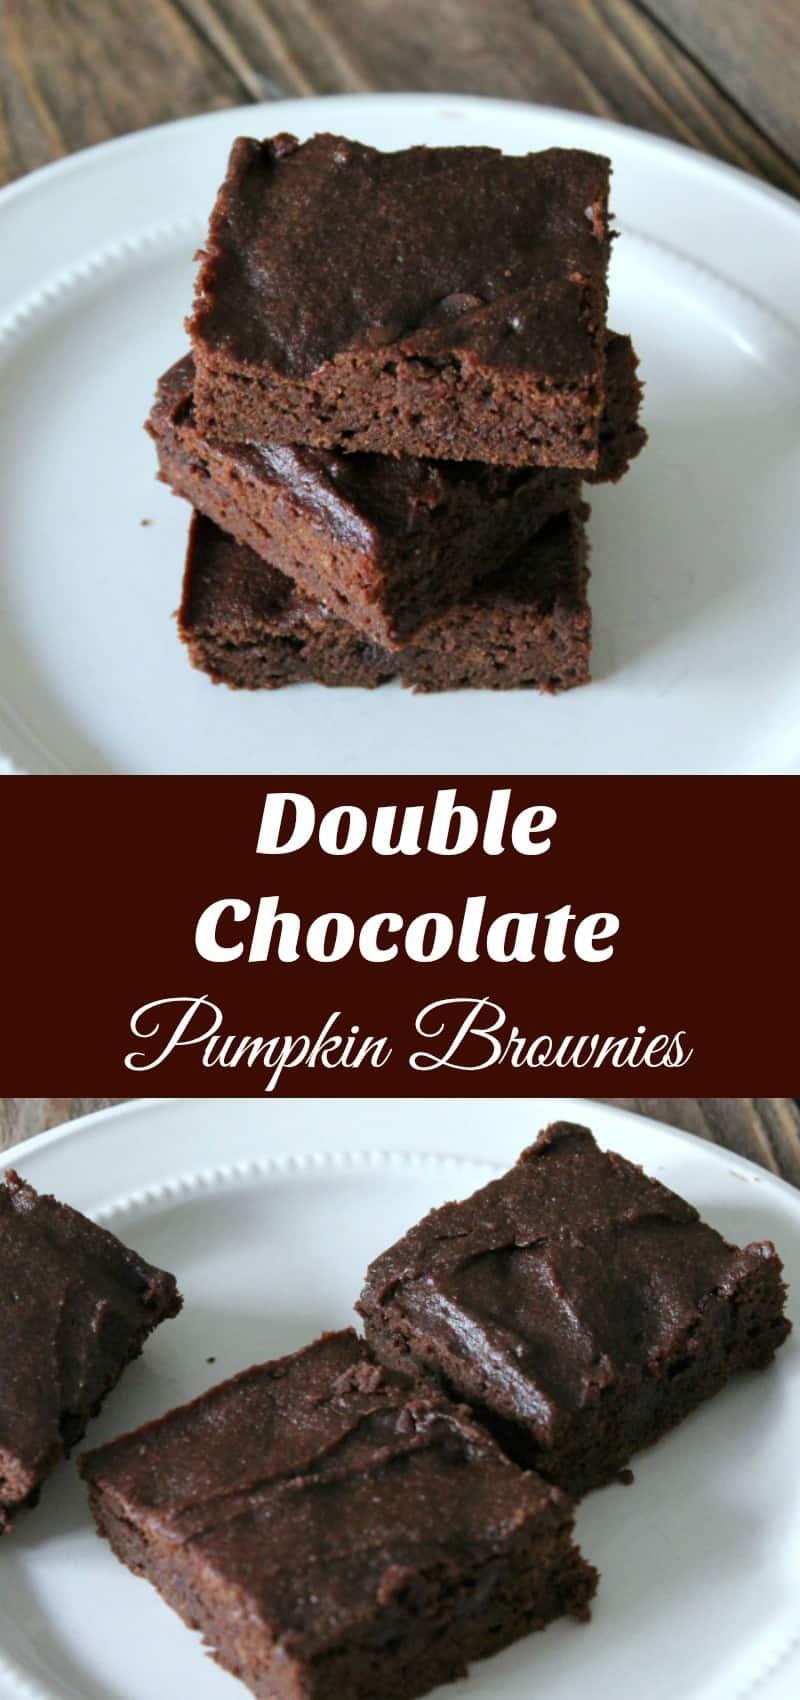 Double Chocolate Pumpkin Brownies